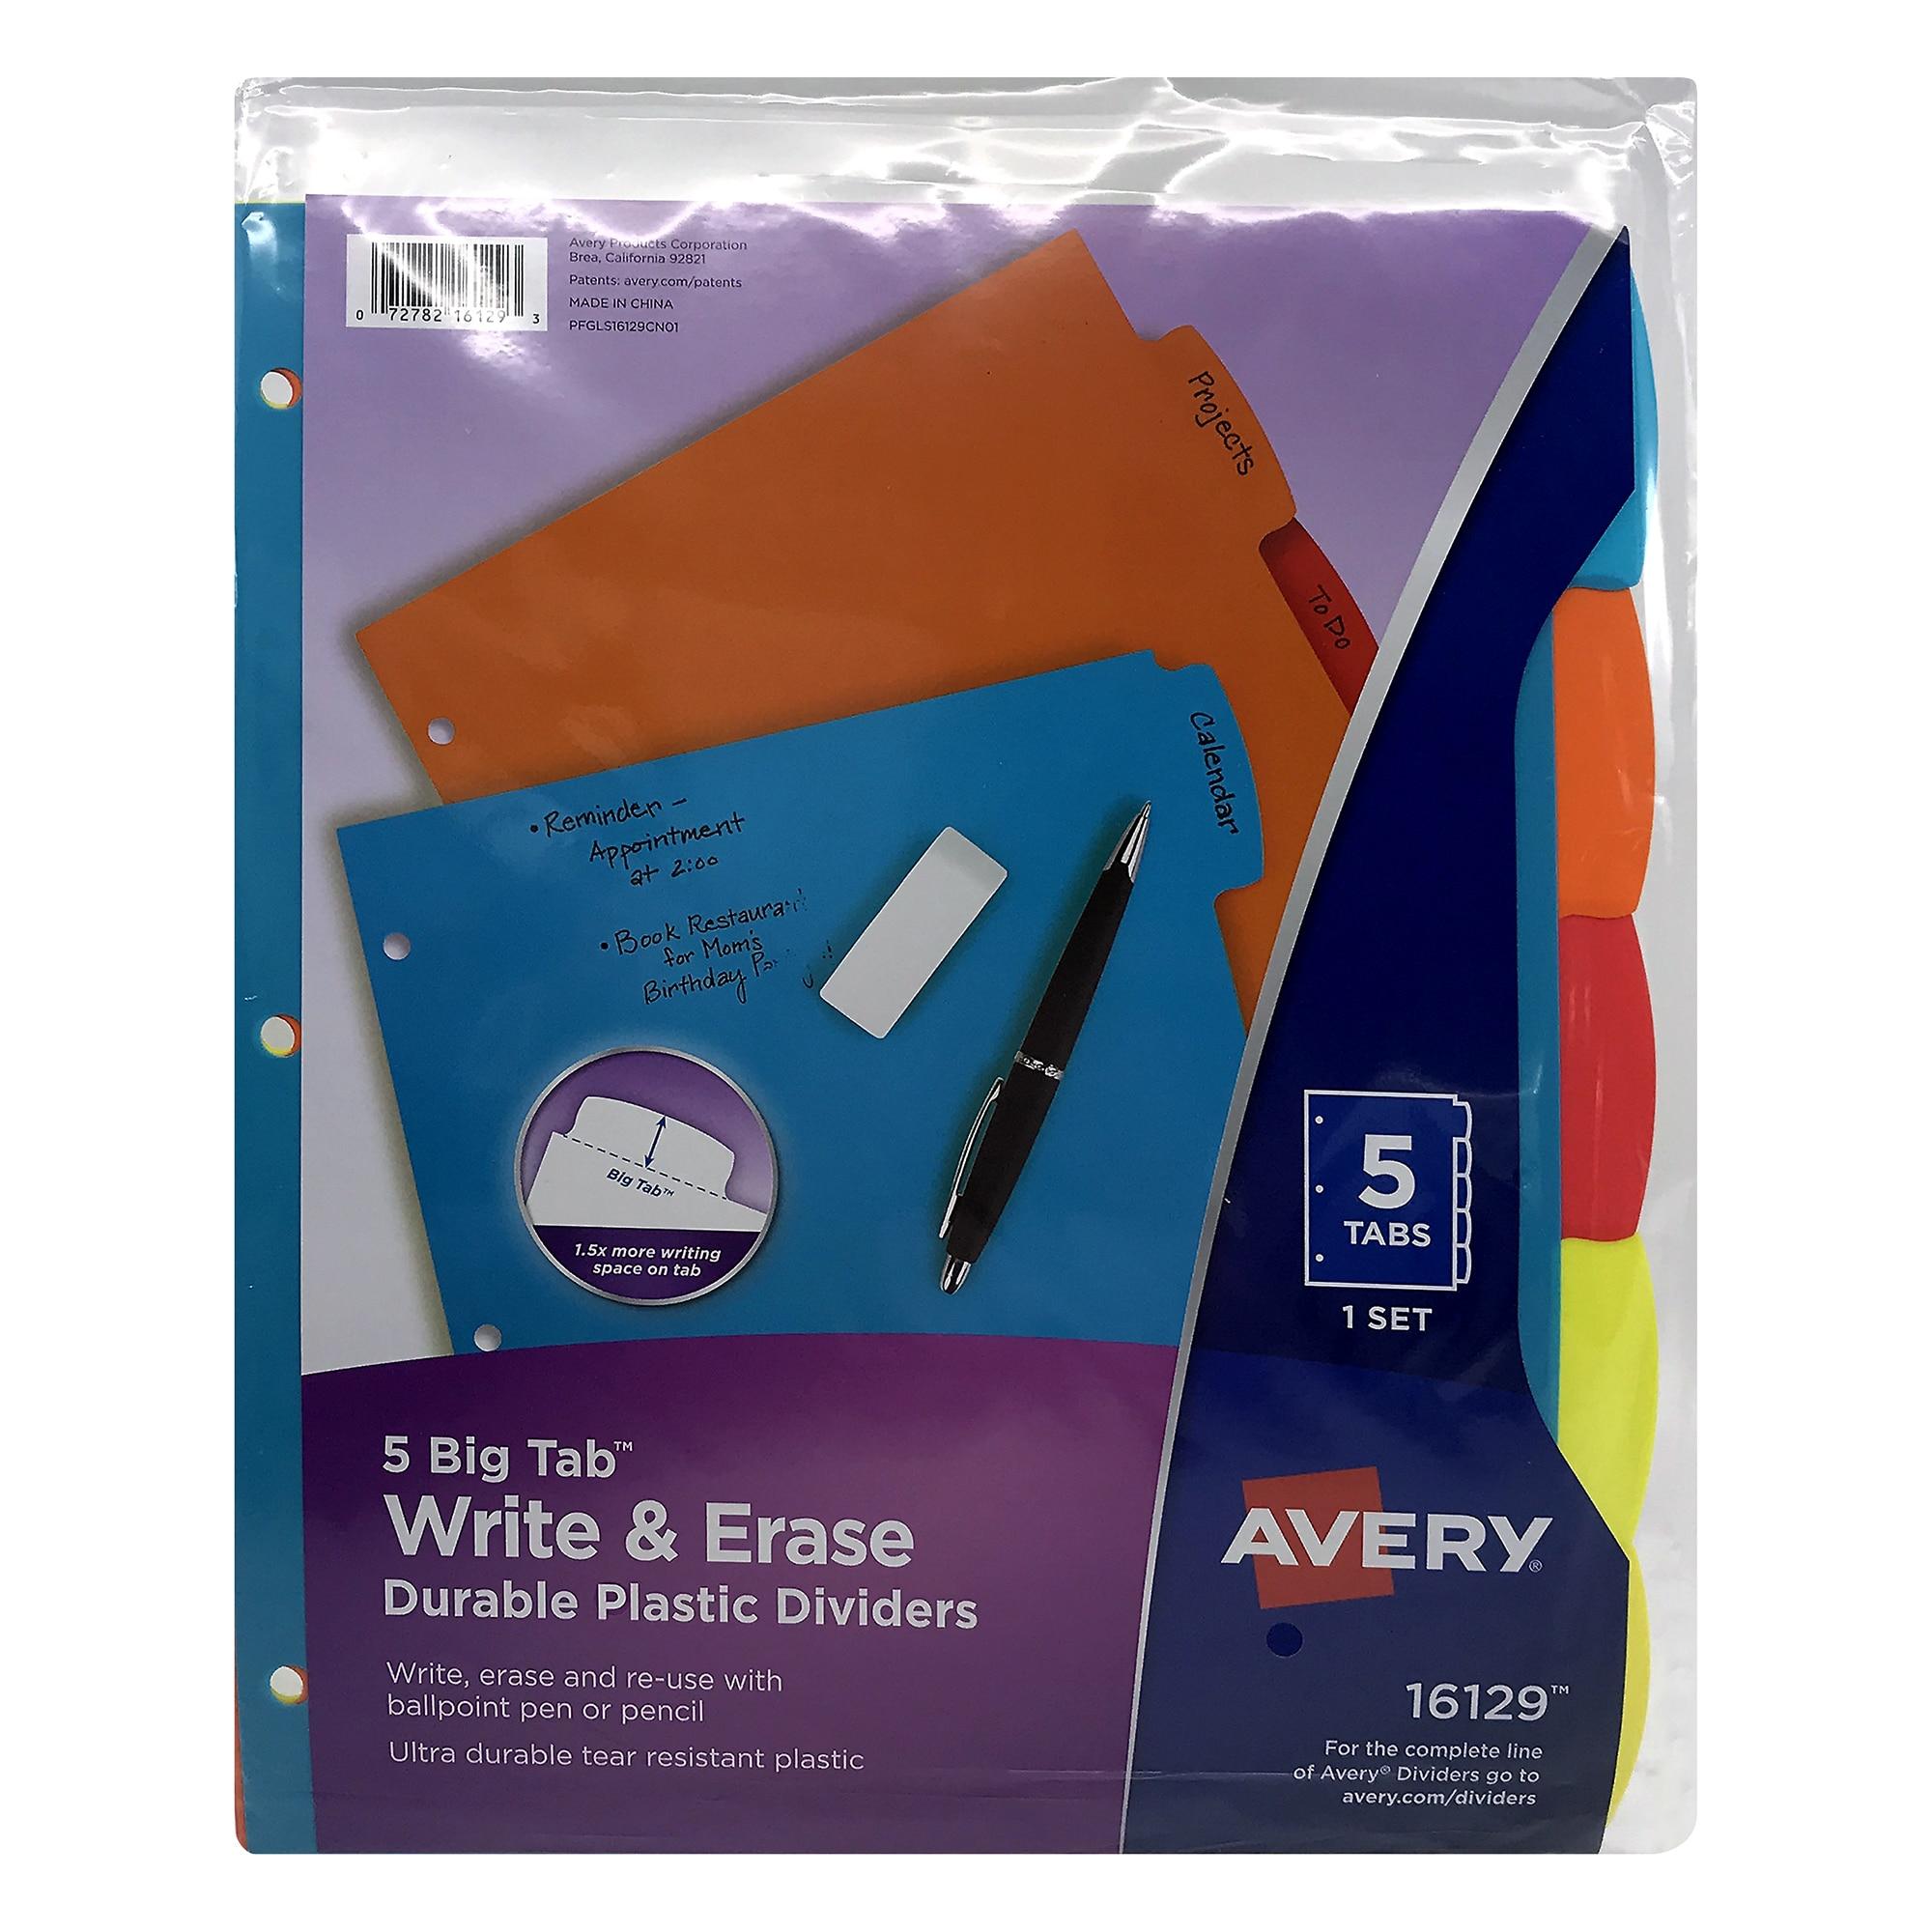 Avery Big Tab Write & Erase Durable Plastic Dividers 5Tab Set Multicolor